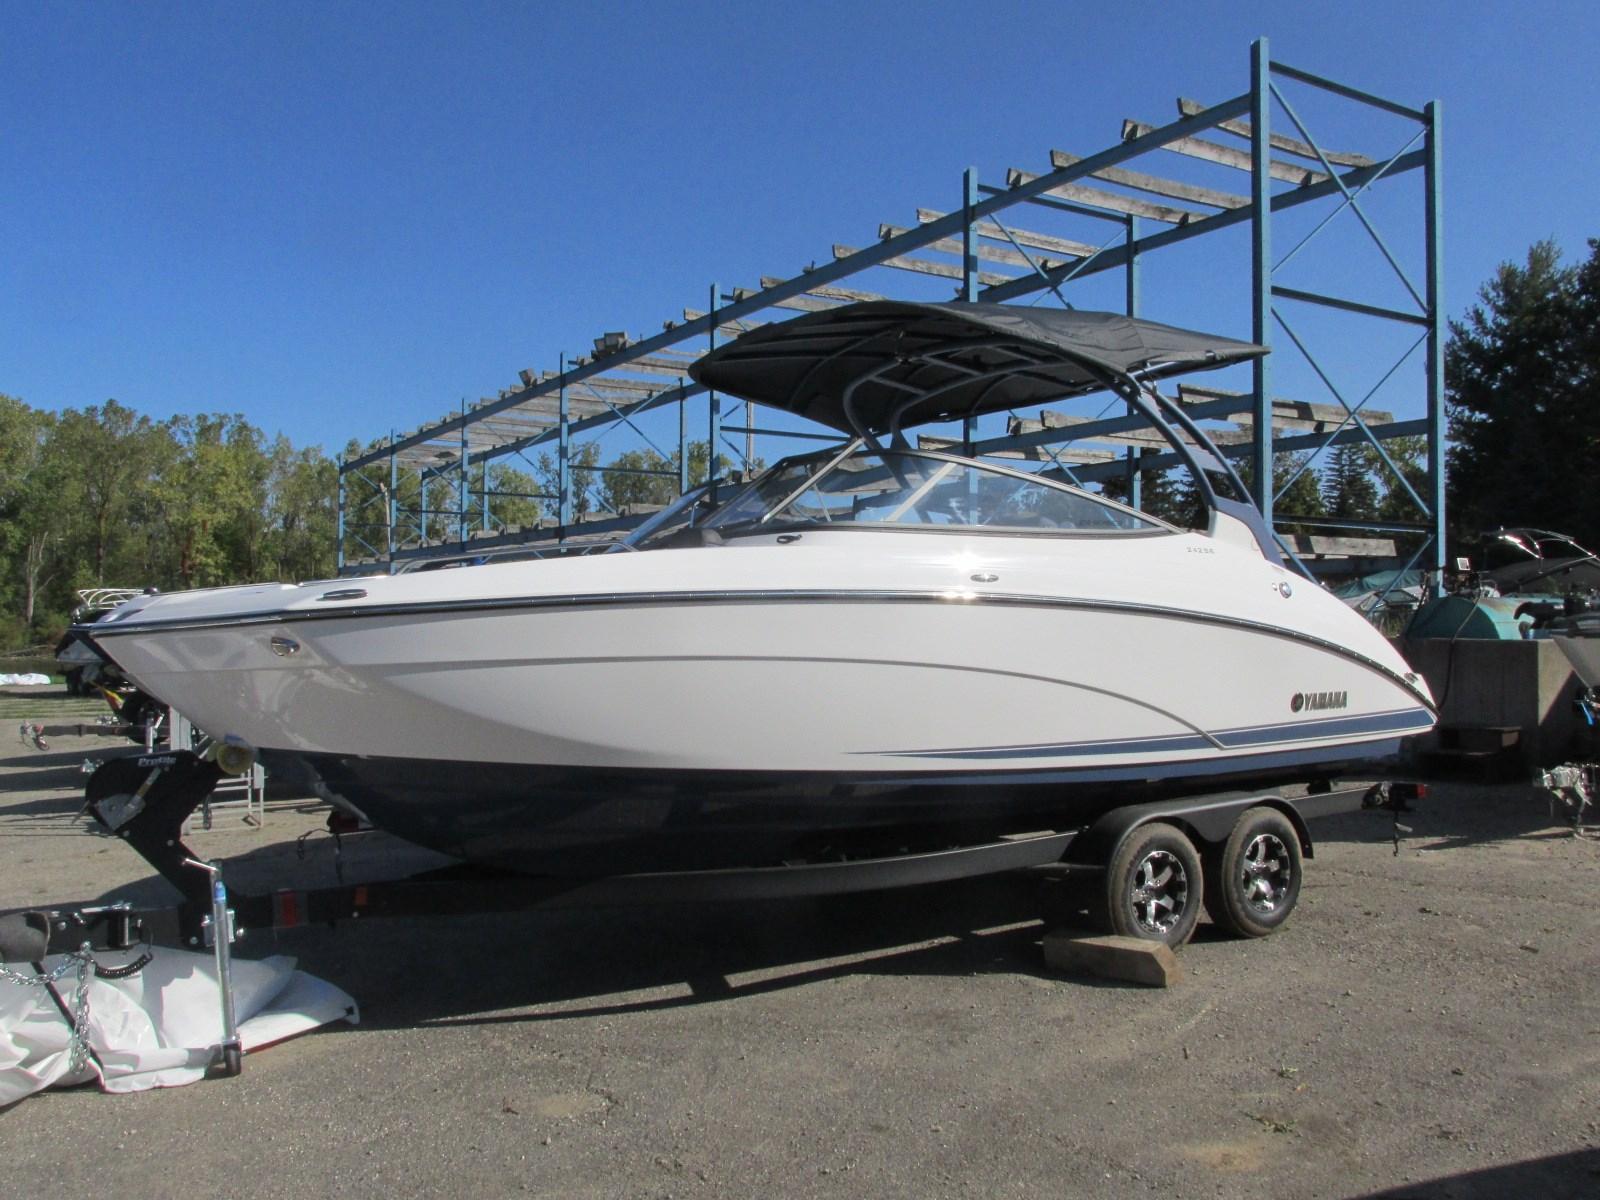 Yamaha Boats242 Limited S E-Series